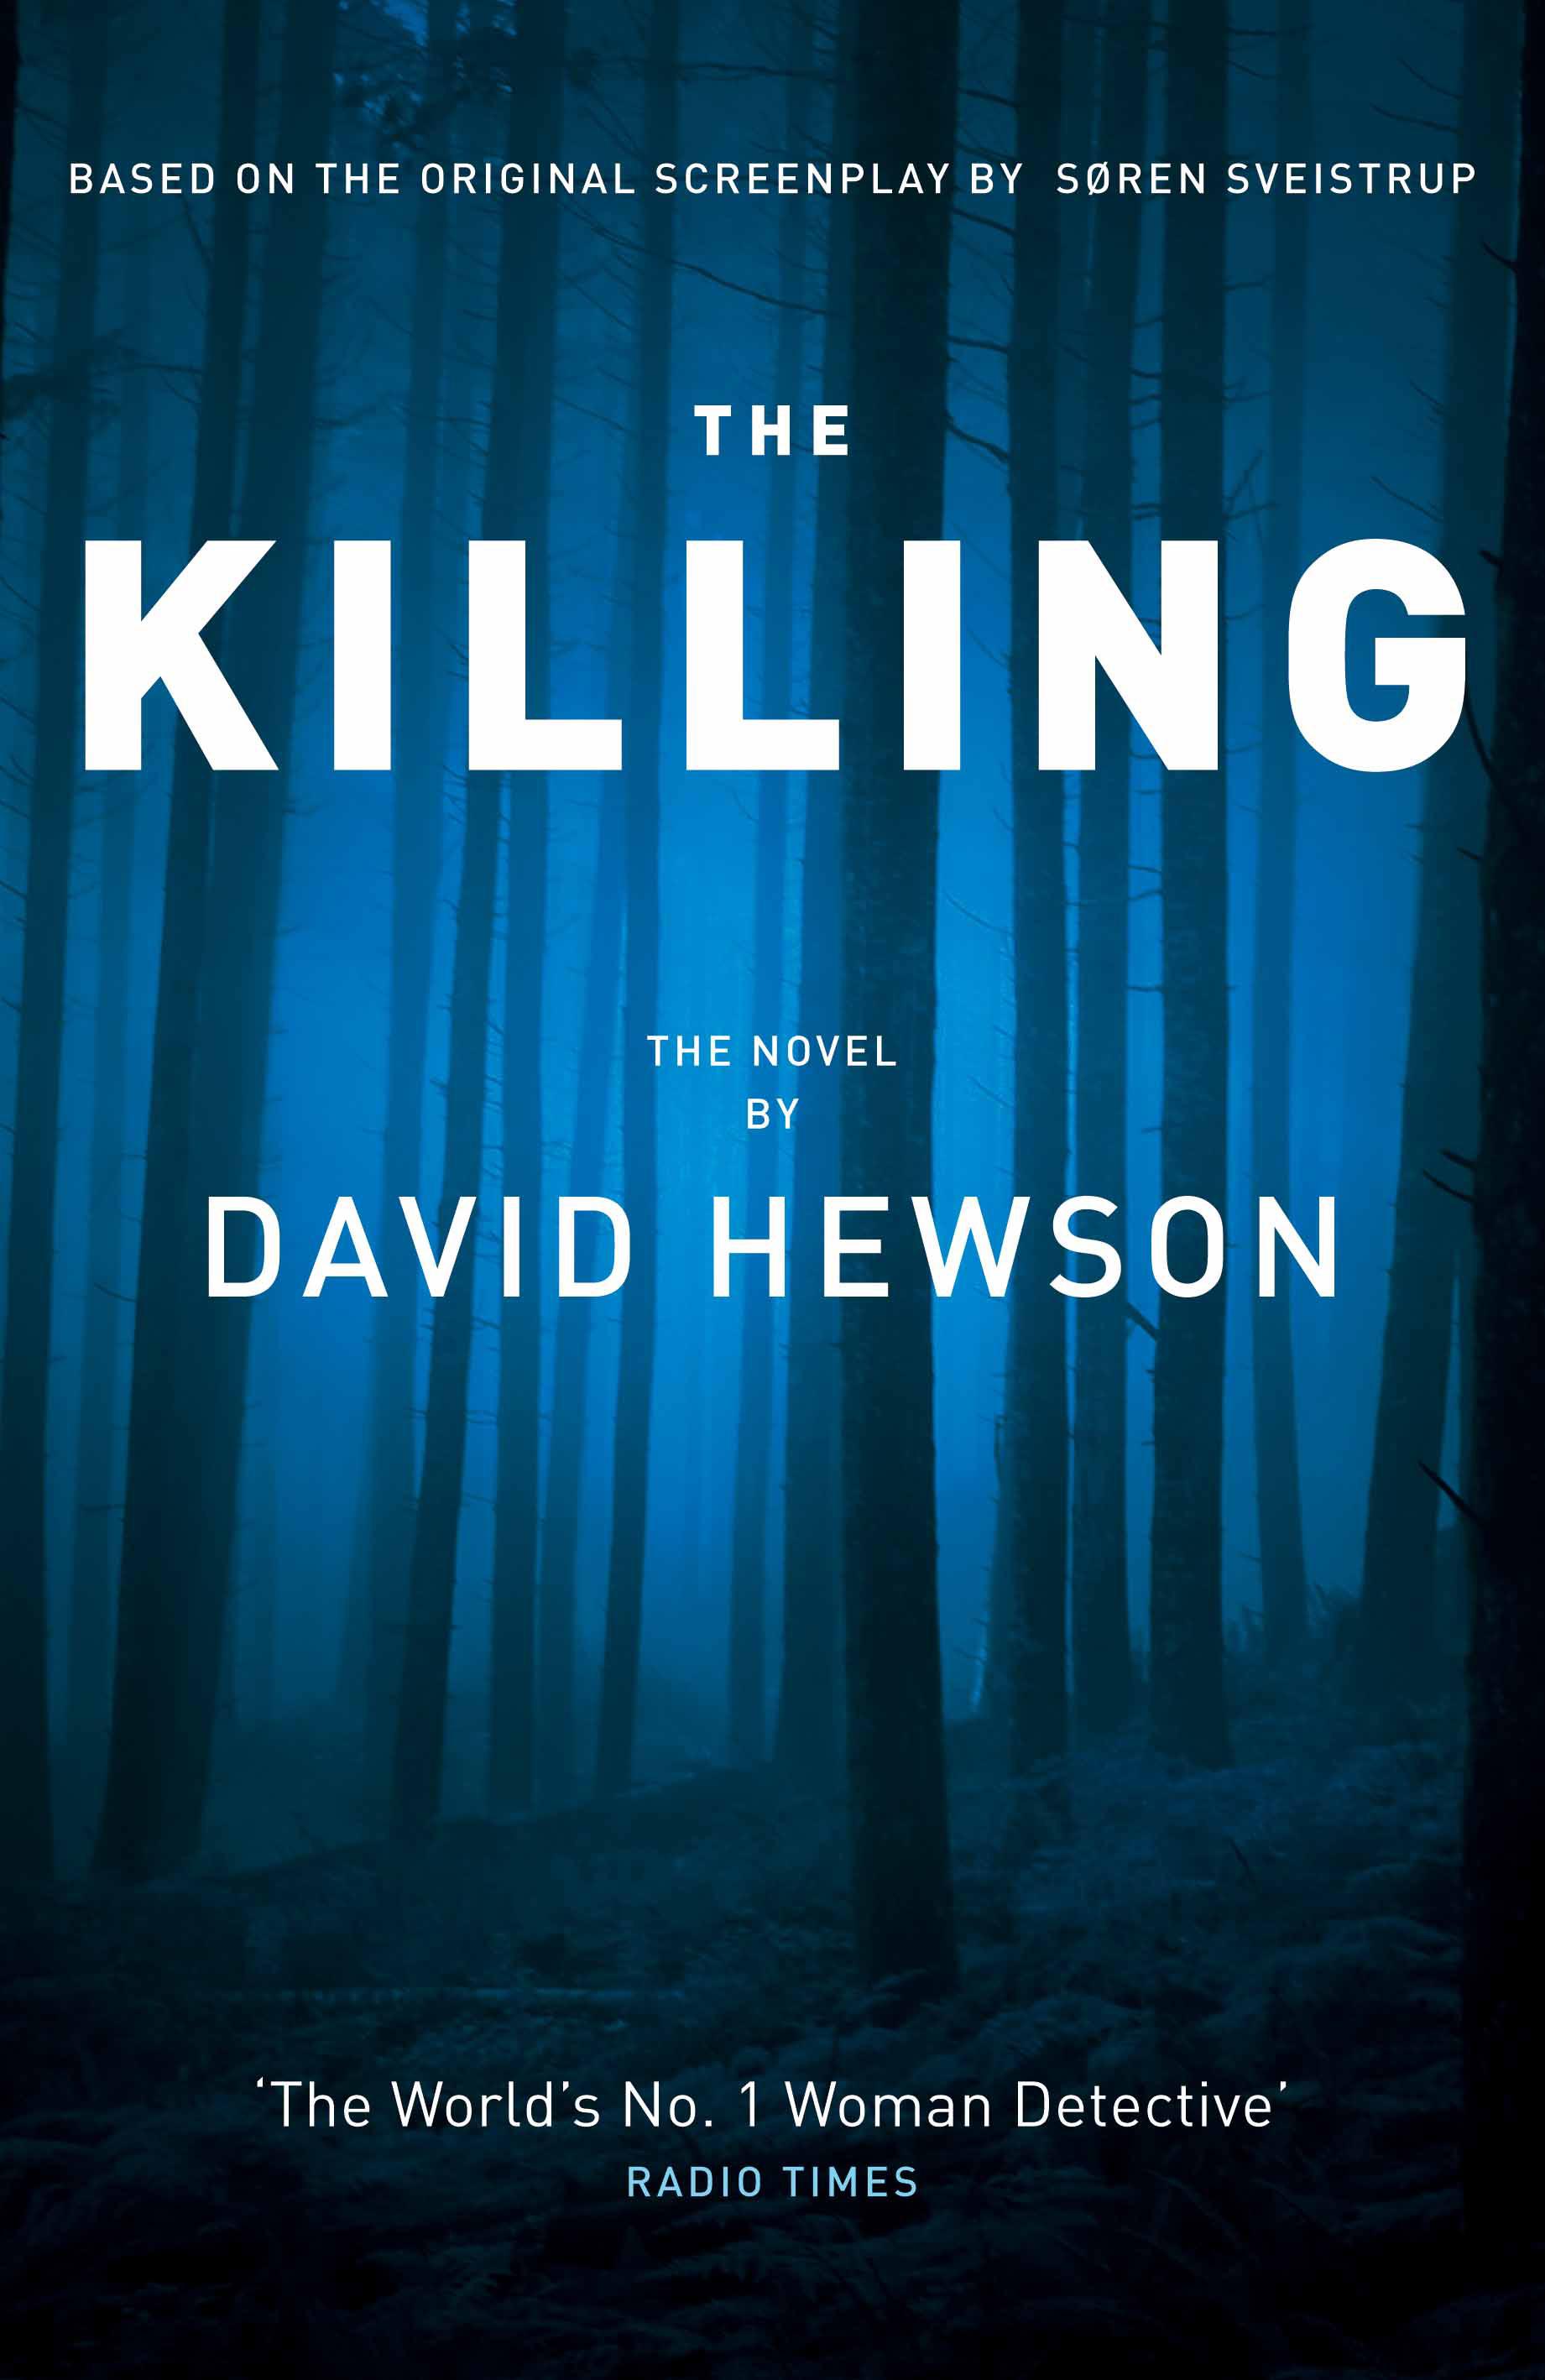 2012-04-10-thekilling1978144721395601.jpg